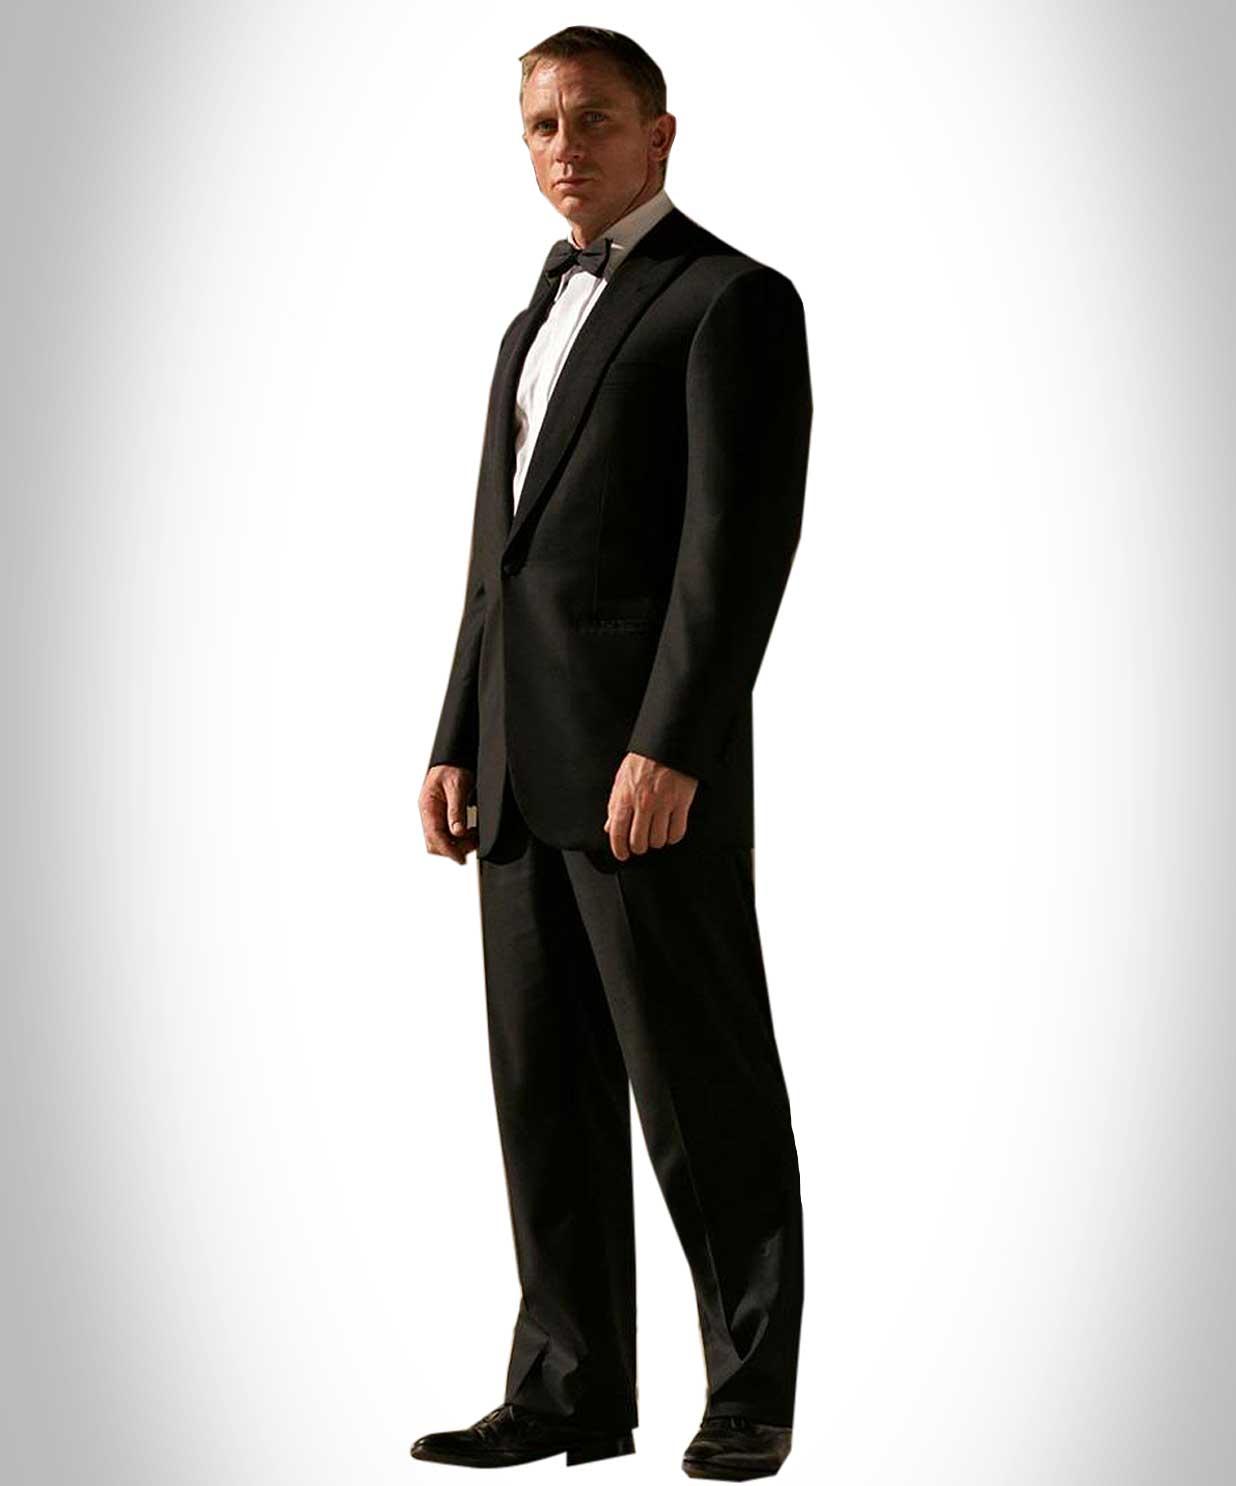 007 casino royale